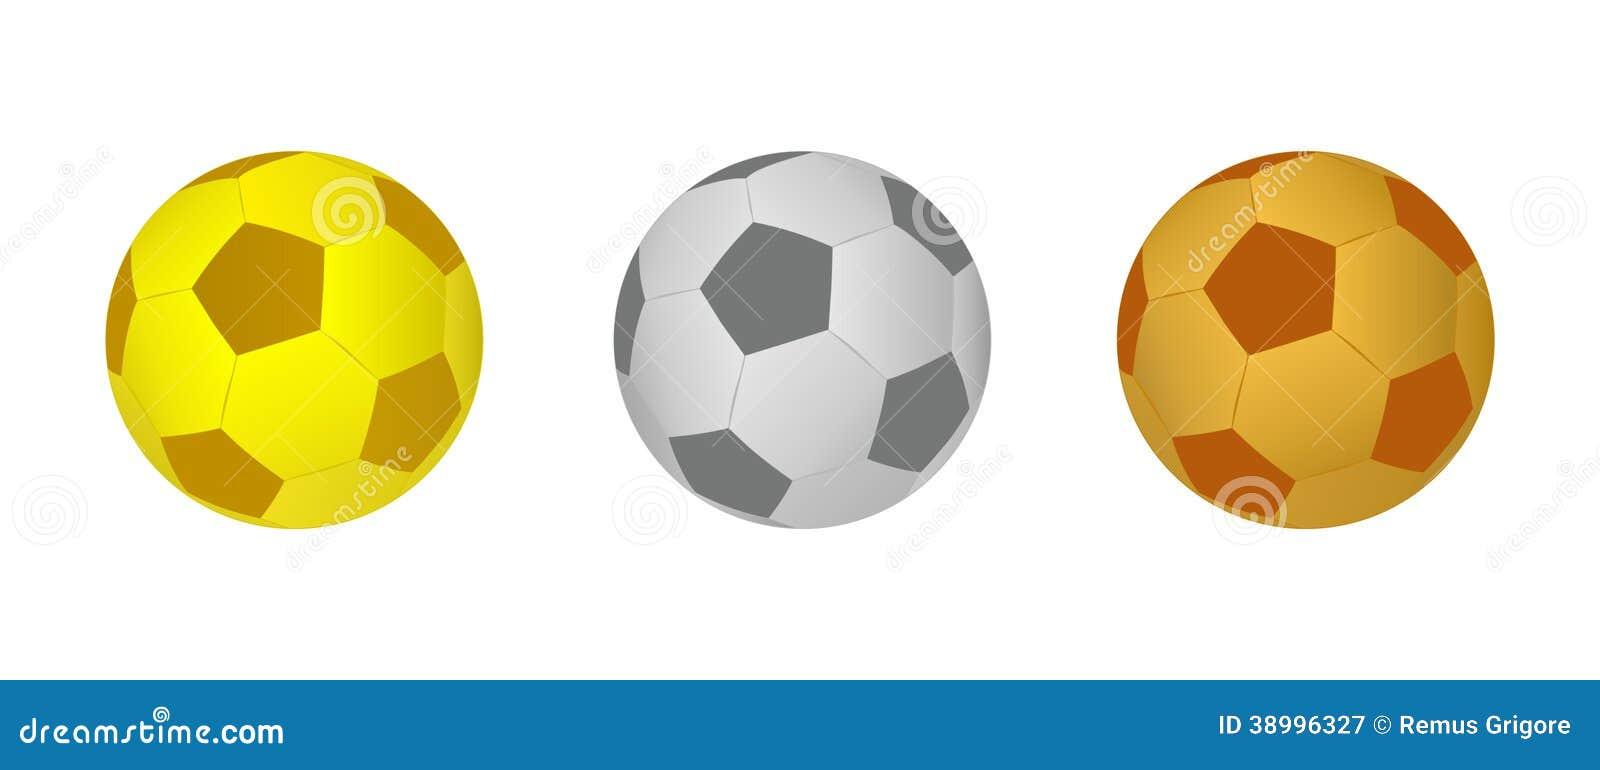 Voetbalballen